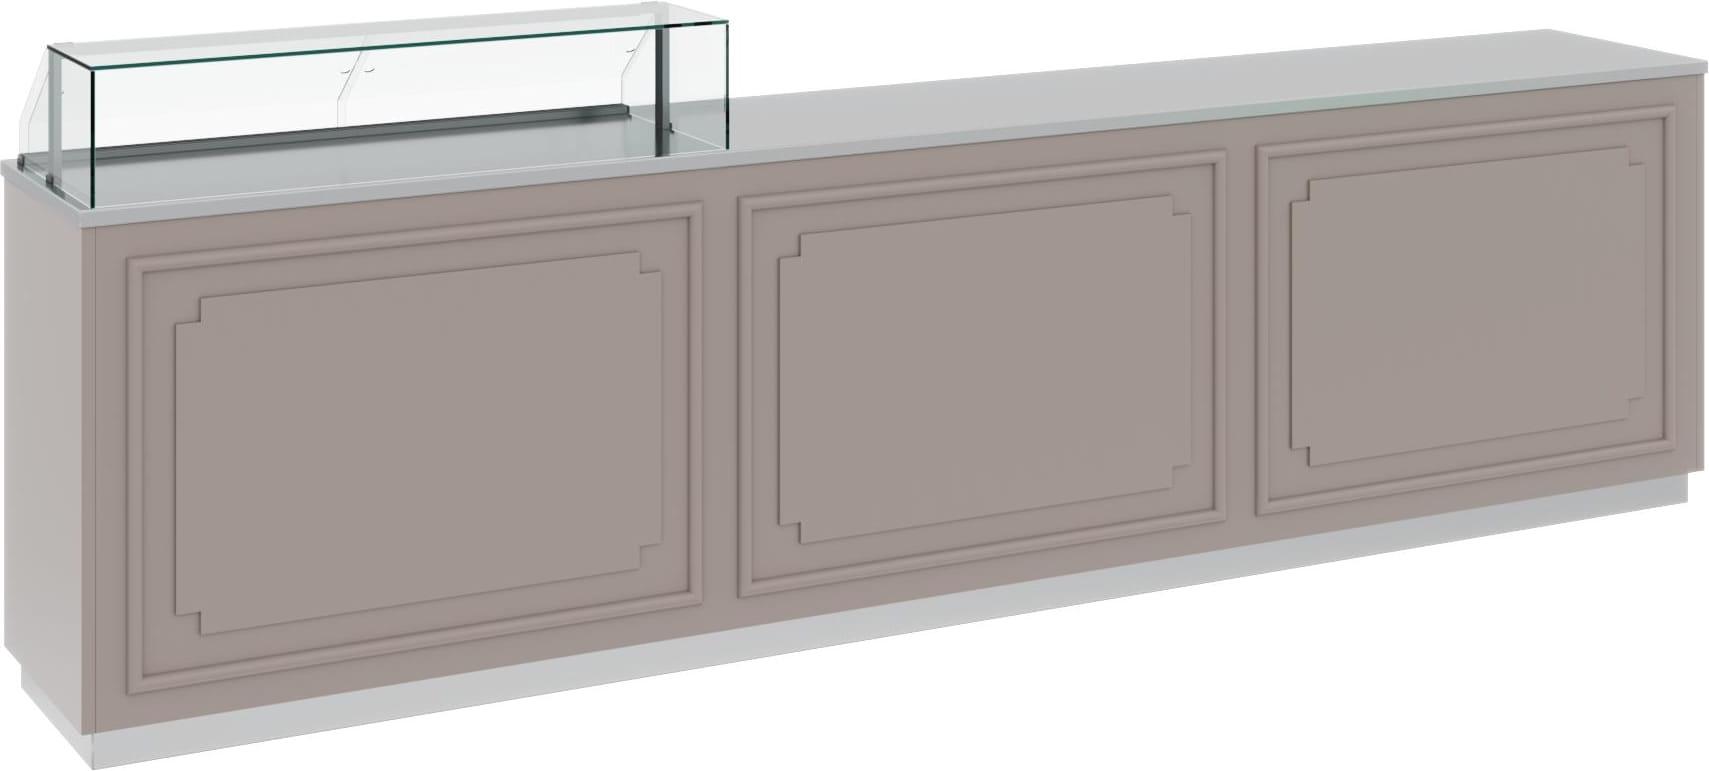 Нейтральная витрина CARBOMA OMI AC40N 1.5-1 - 1